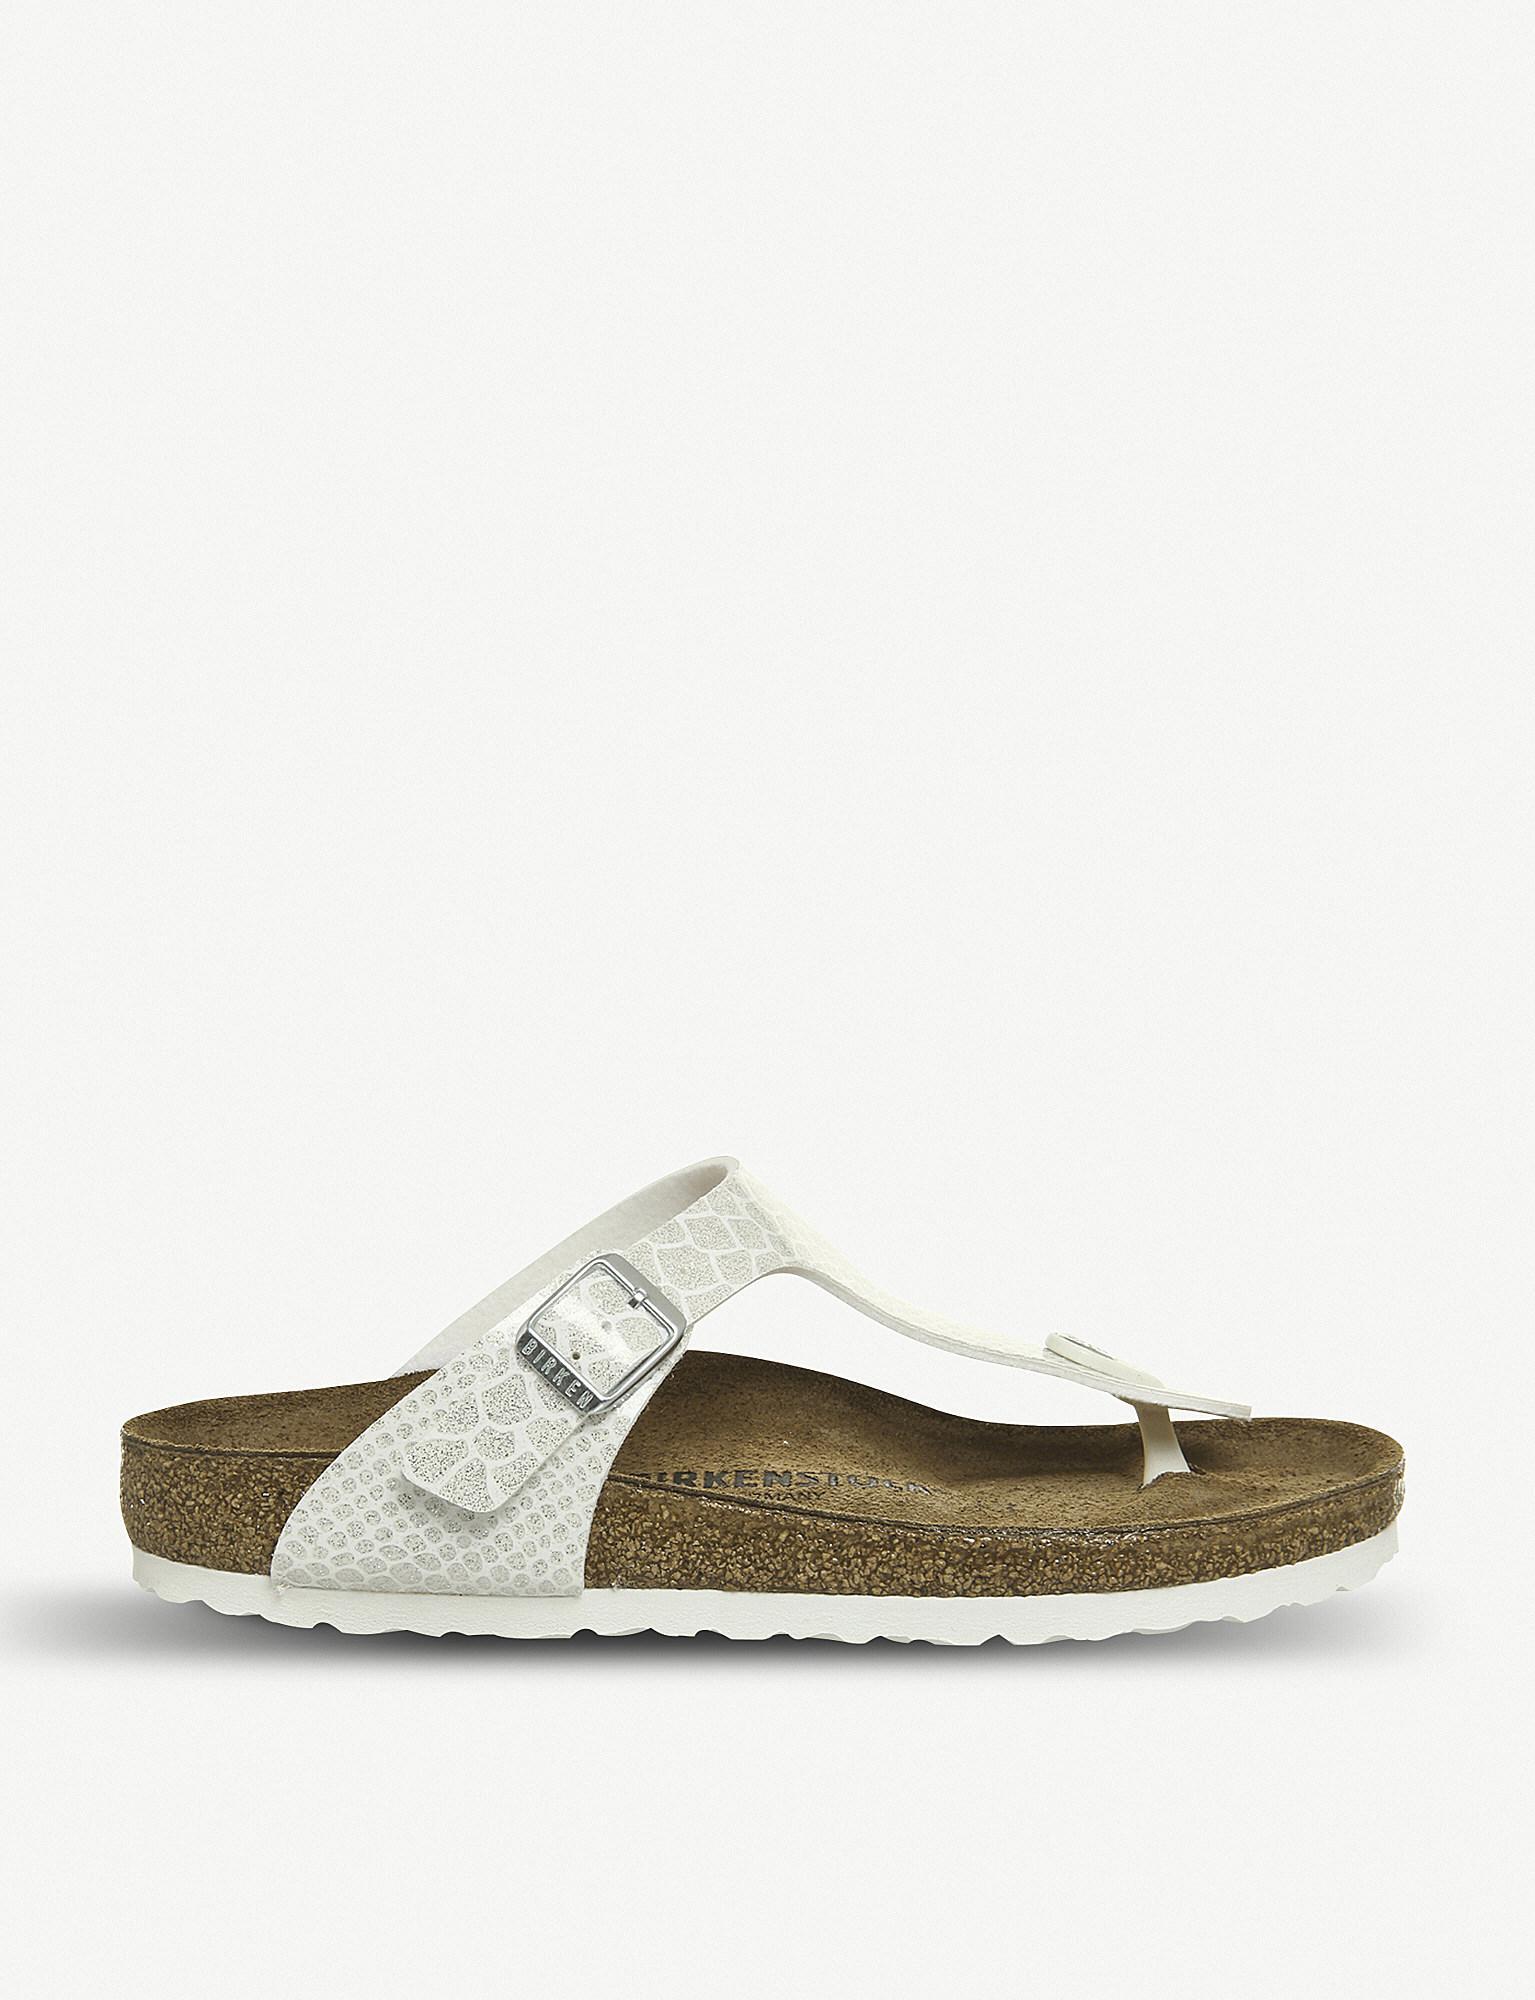 174b00fcf07c Birkenstock. Women s Gizeh Birko-flor Thong Sandals